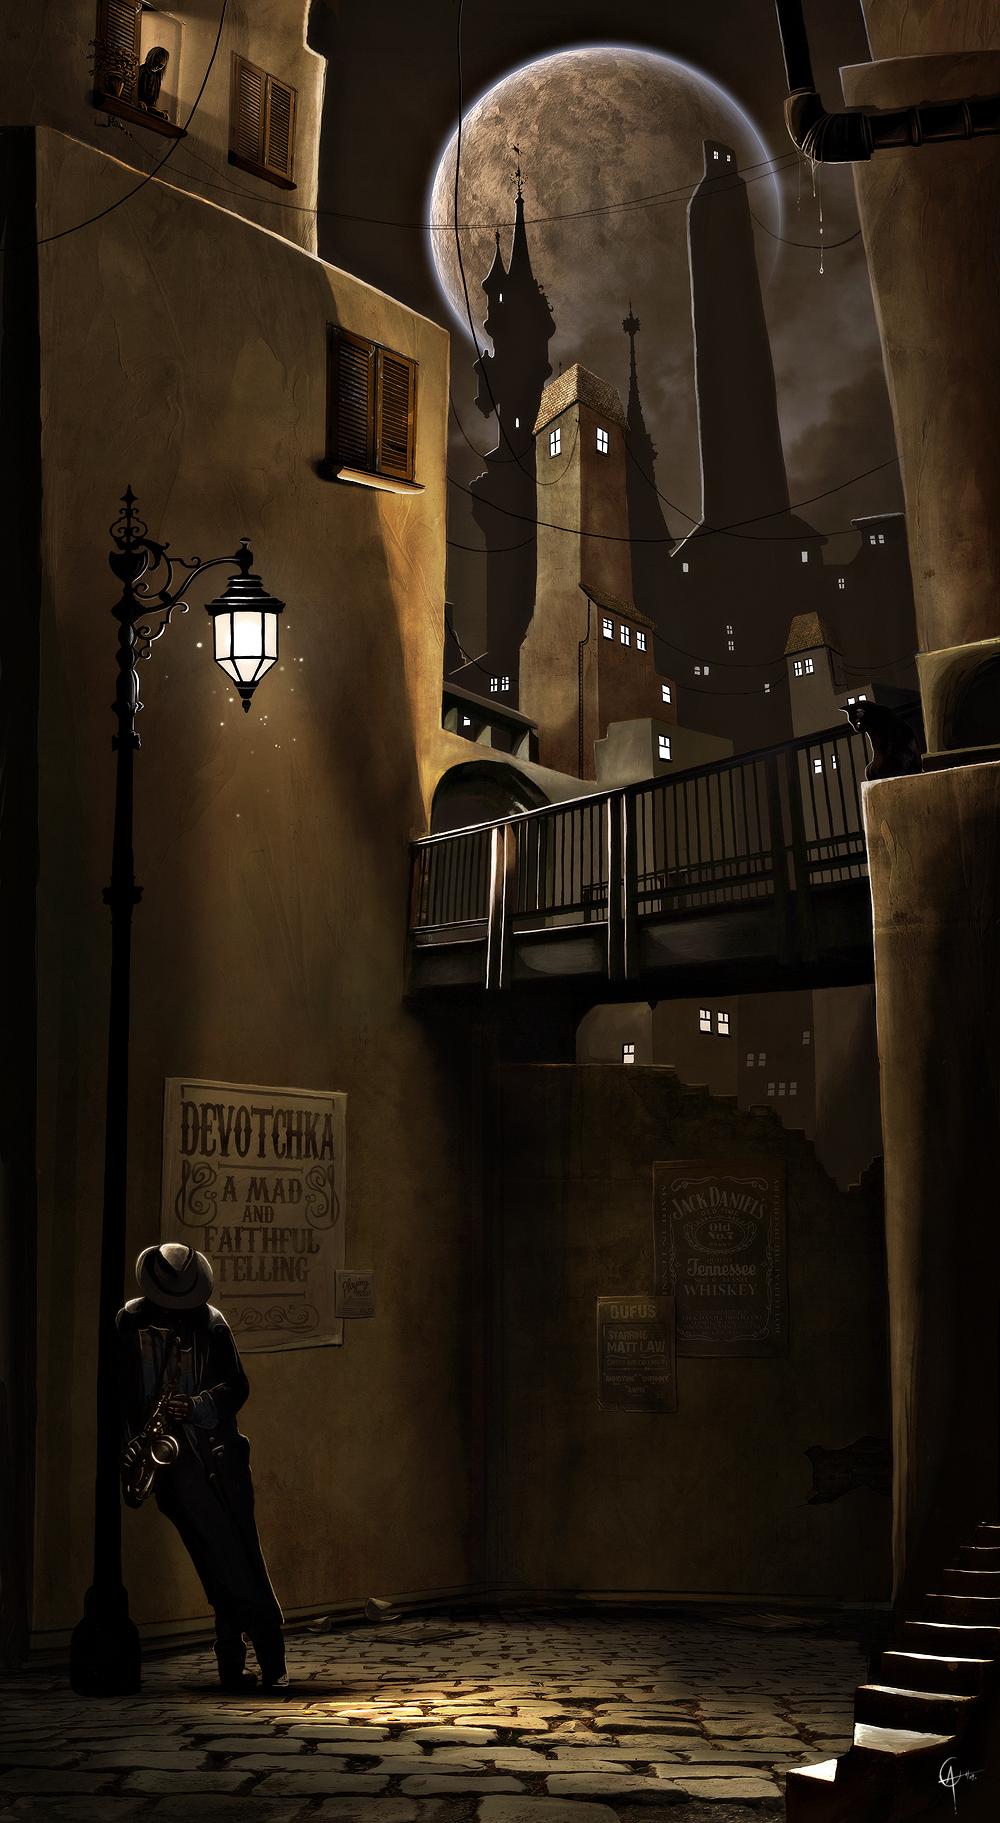 Straat Muzikant by AlexanderCasteels